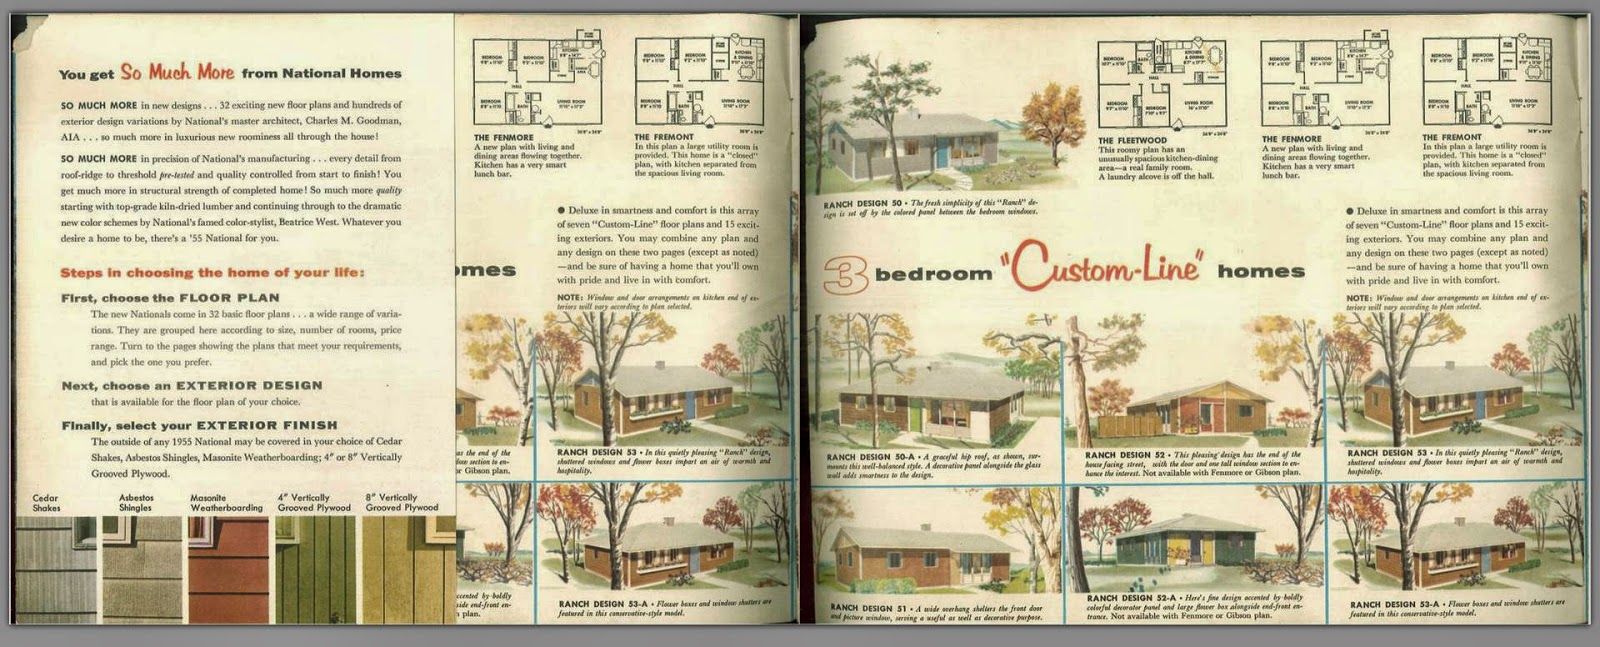 Modular Home Builder Prefab Homebuilding 60 Years Ago